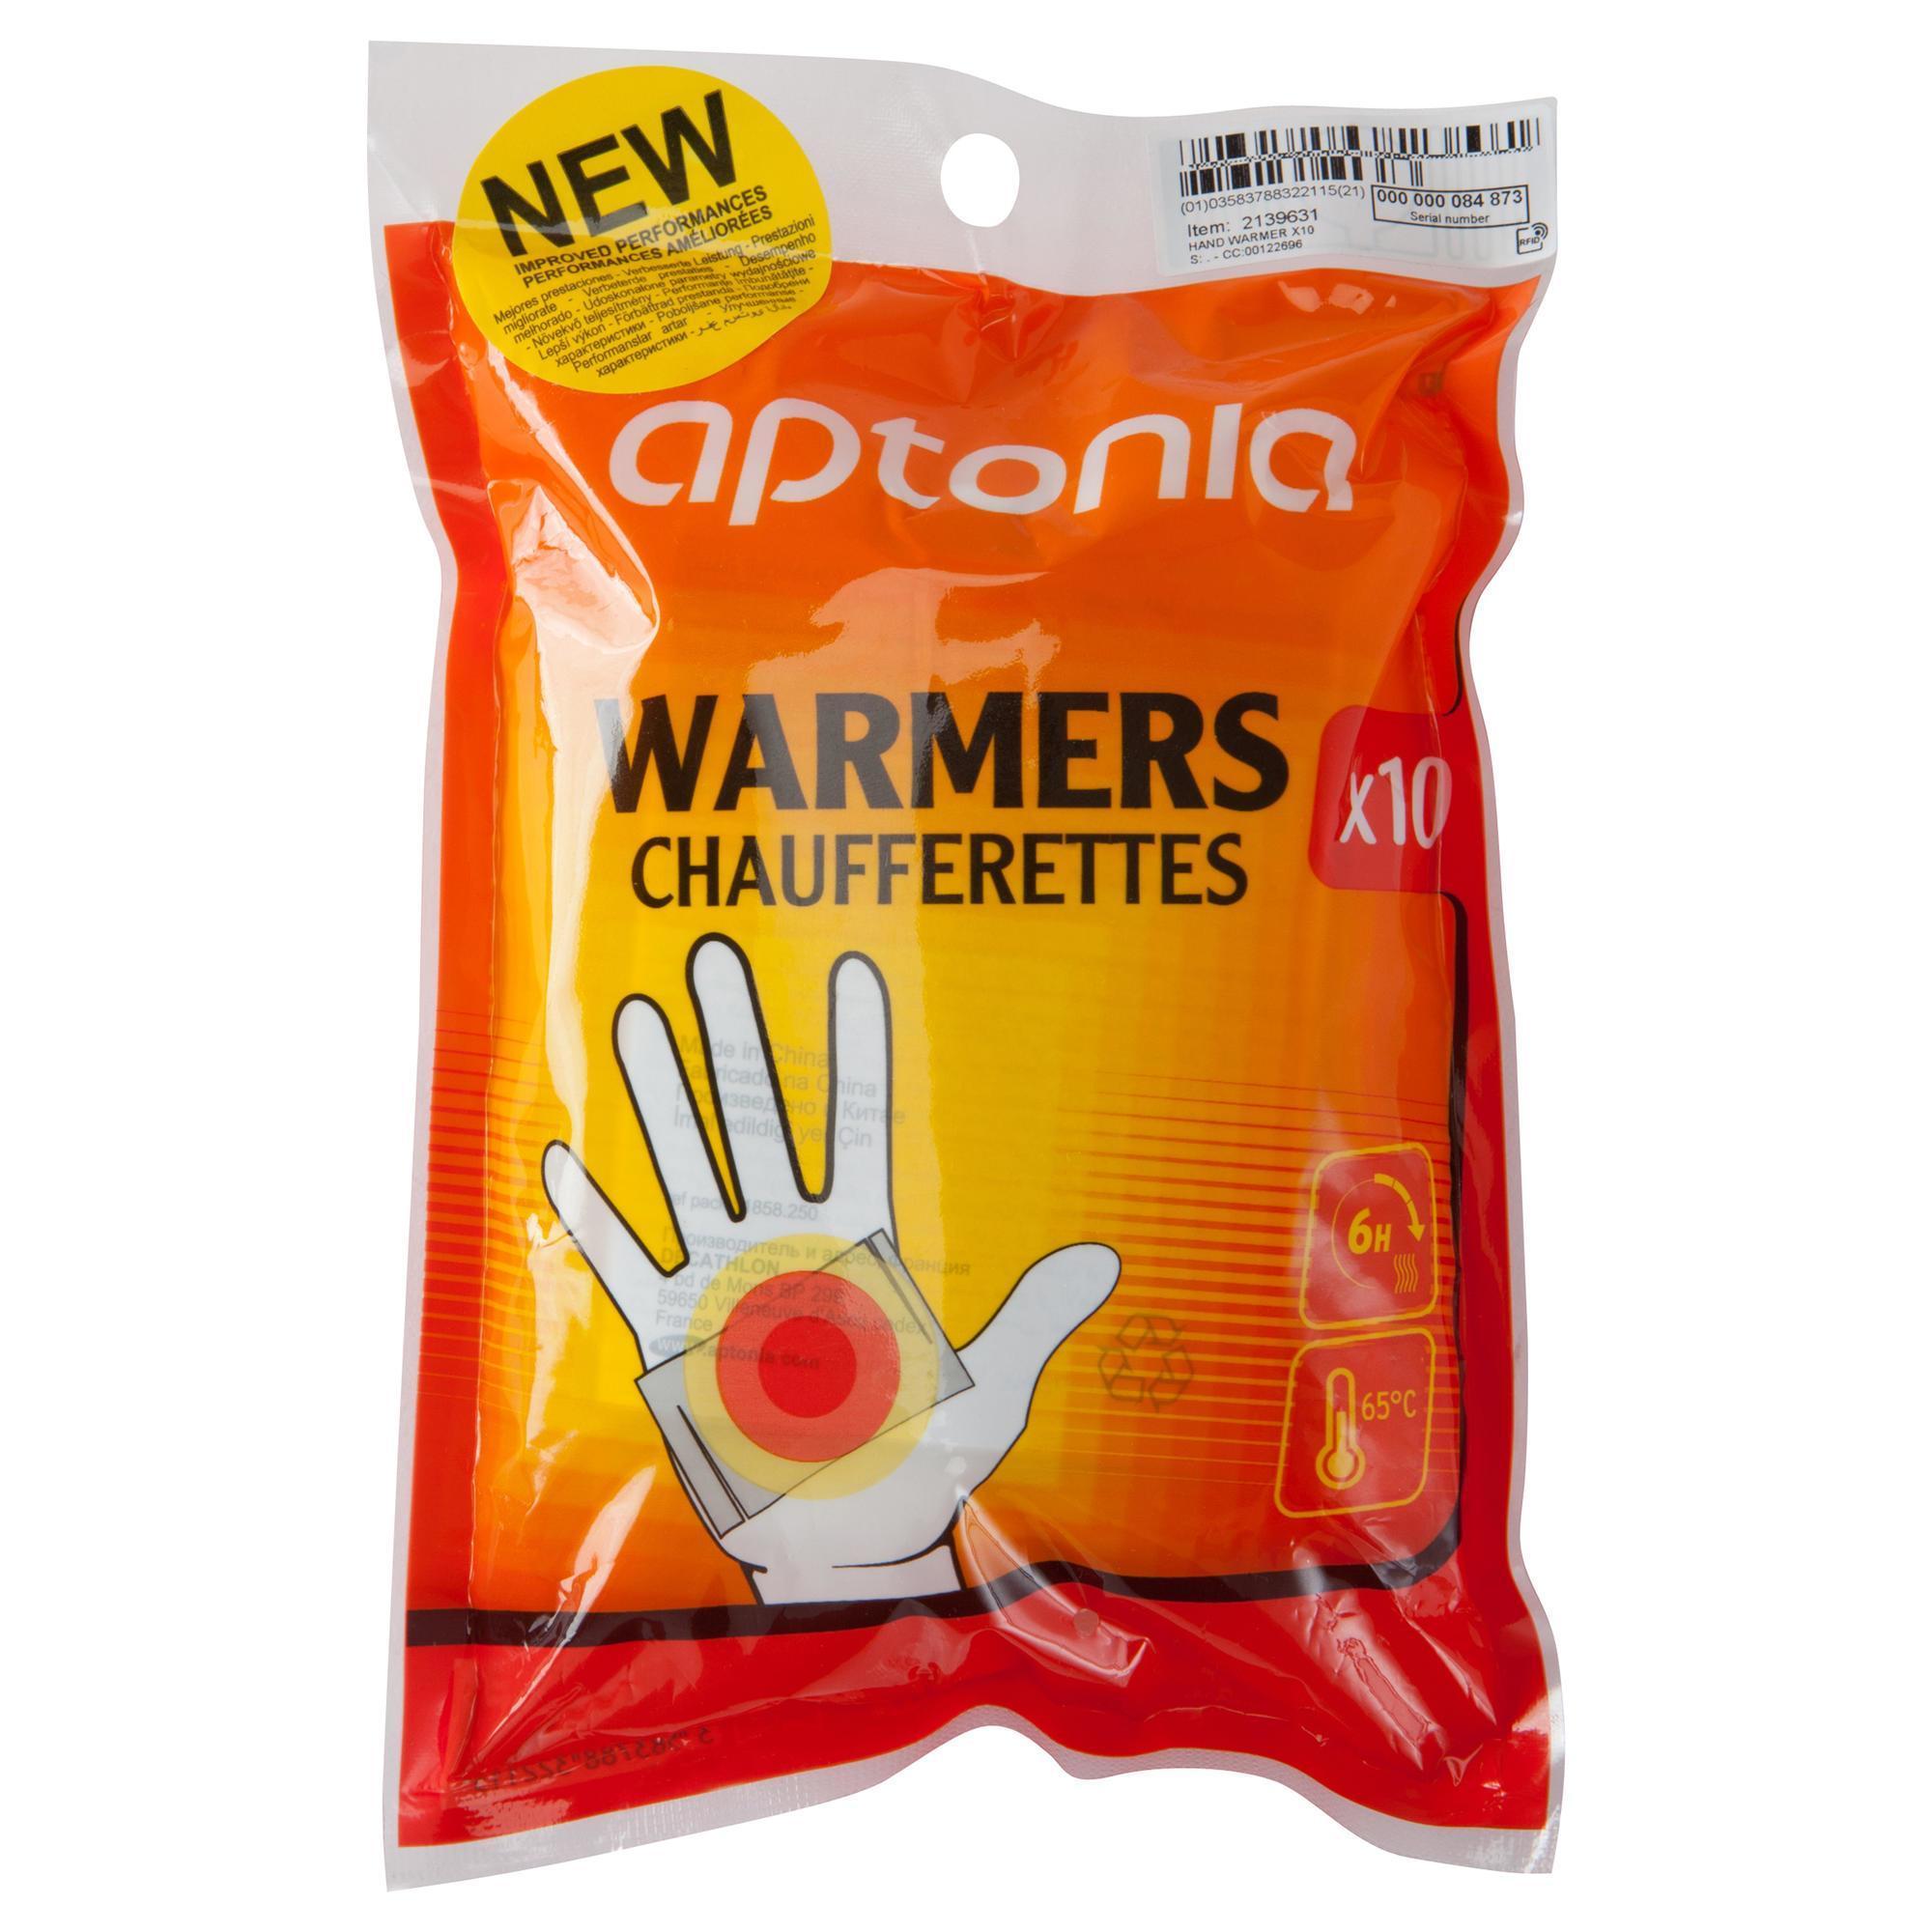 Aptonia Handwarmers x10 thumbnail